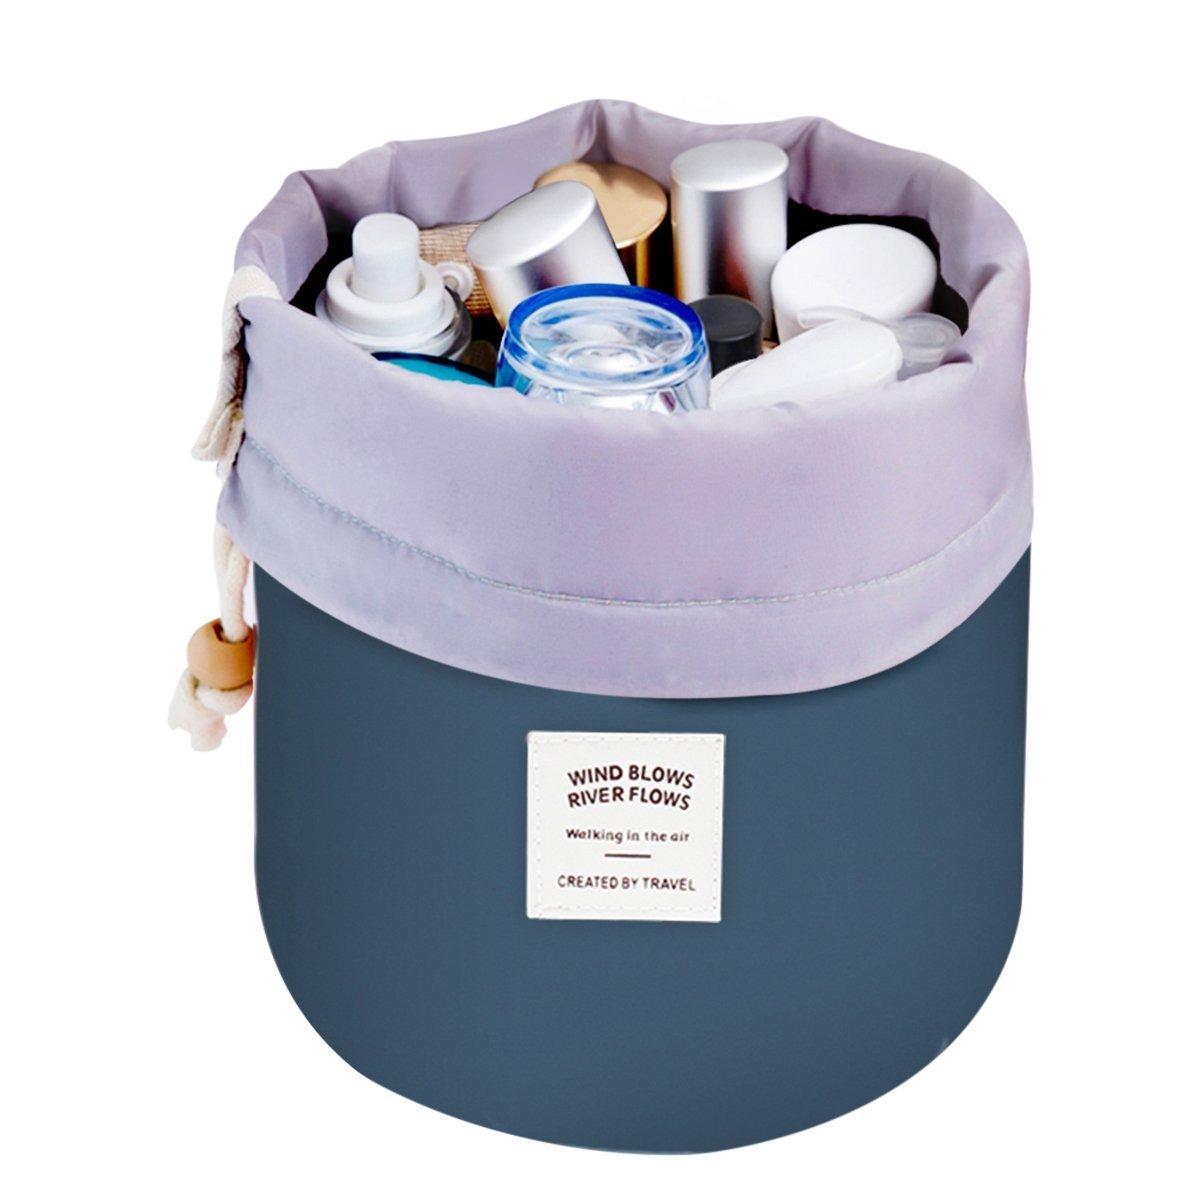 Doshop Toiletry Bag Travel Makeup Bag Men Women Hanging Wash Bags Large Capacity Drawstring Cosmetic Make up Bag Blue + Mini Pouch + Clear PVC Brush Bag (Rose